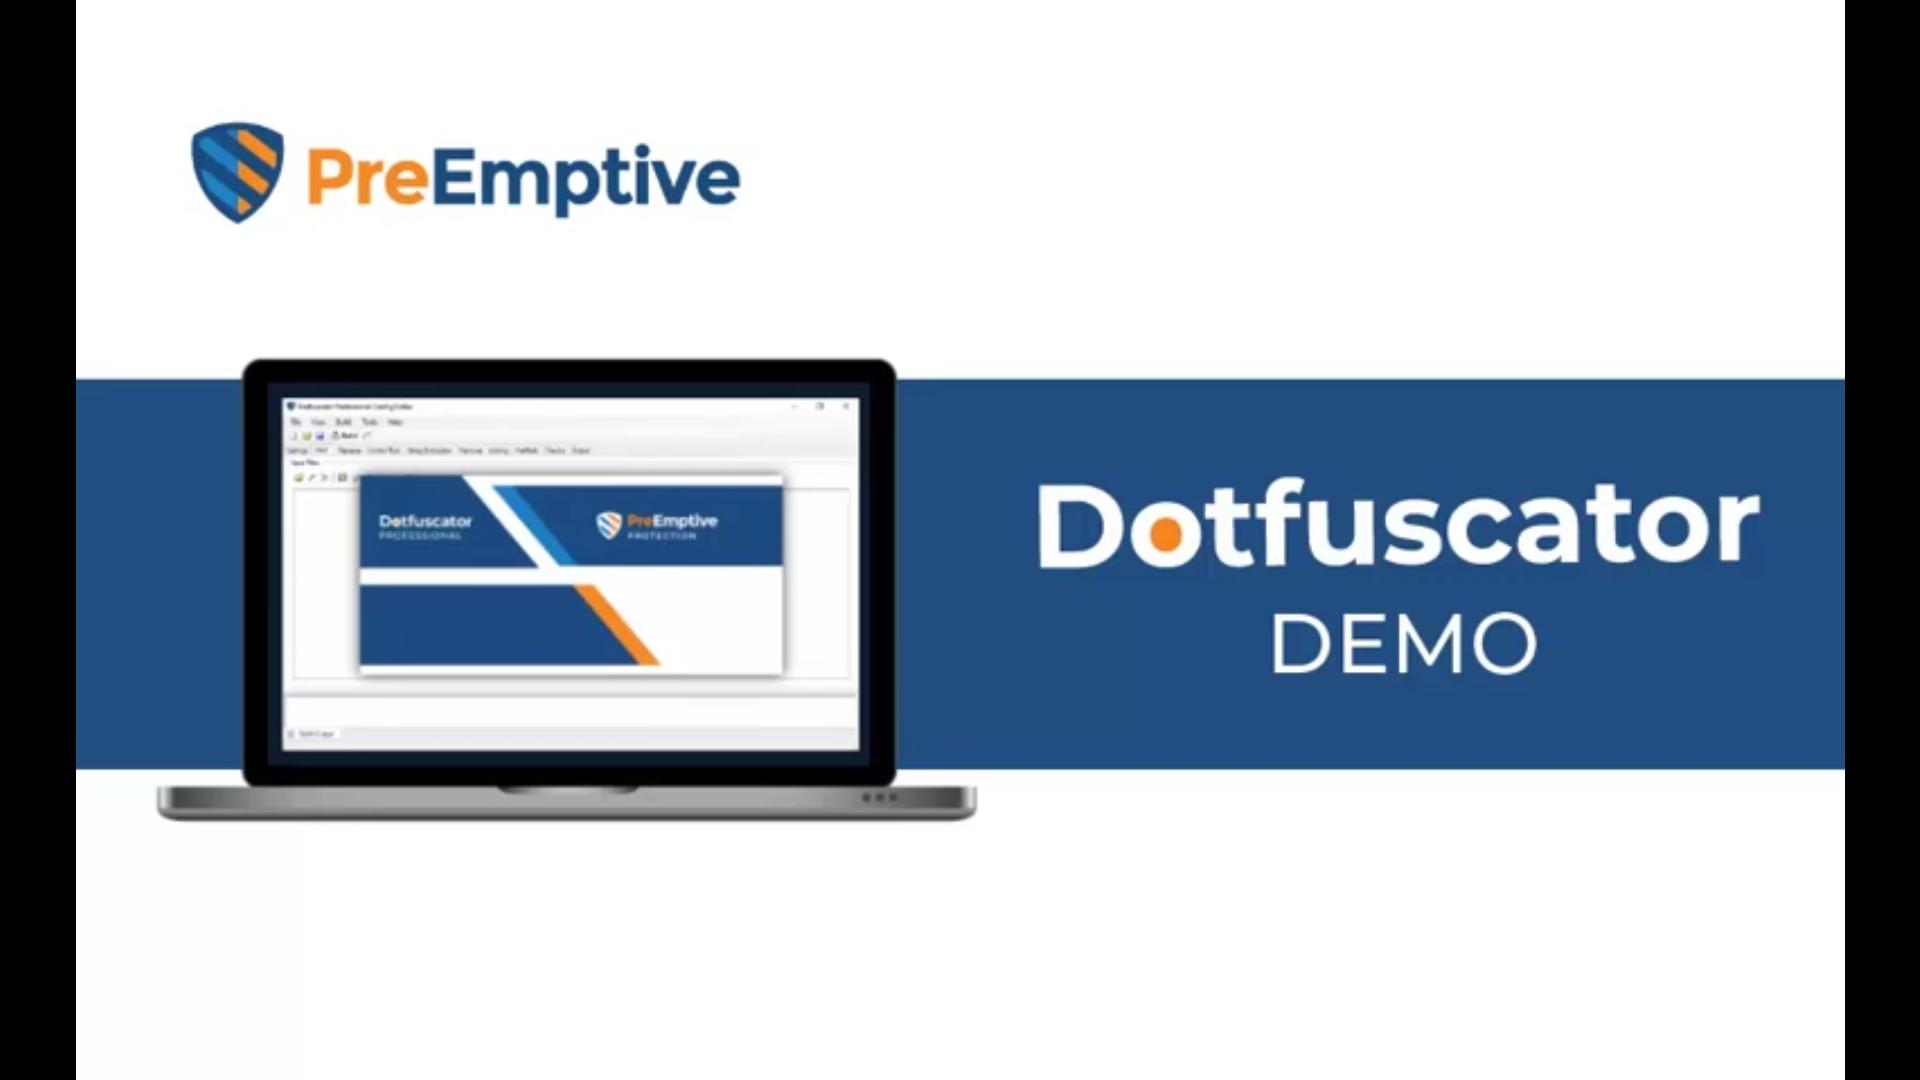 Protection Dotfuscator混淆DLL程序集过程和效果演示